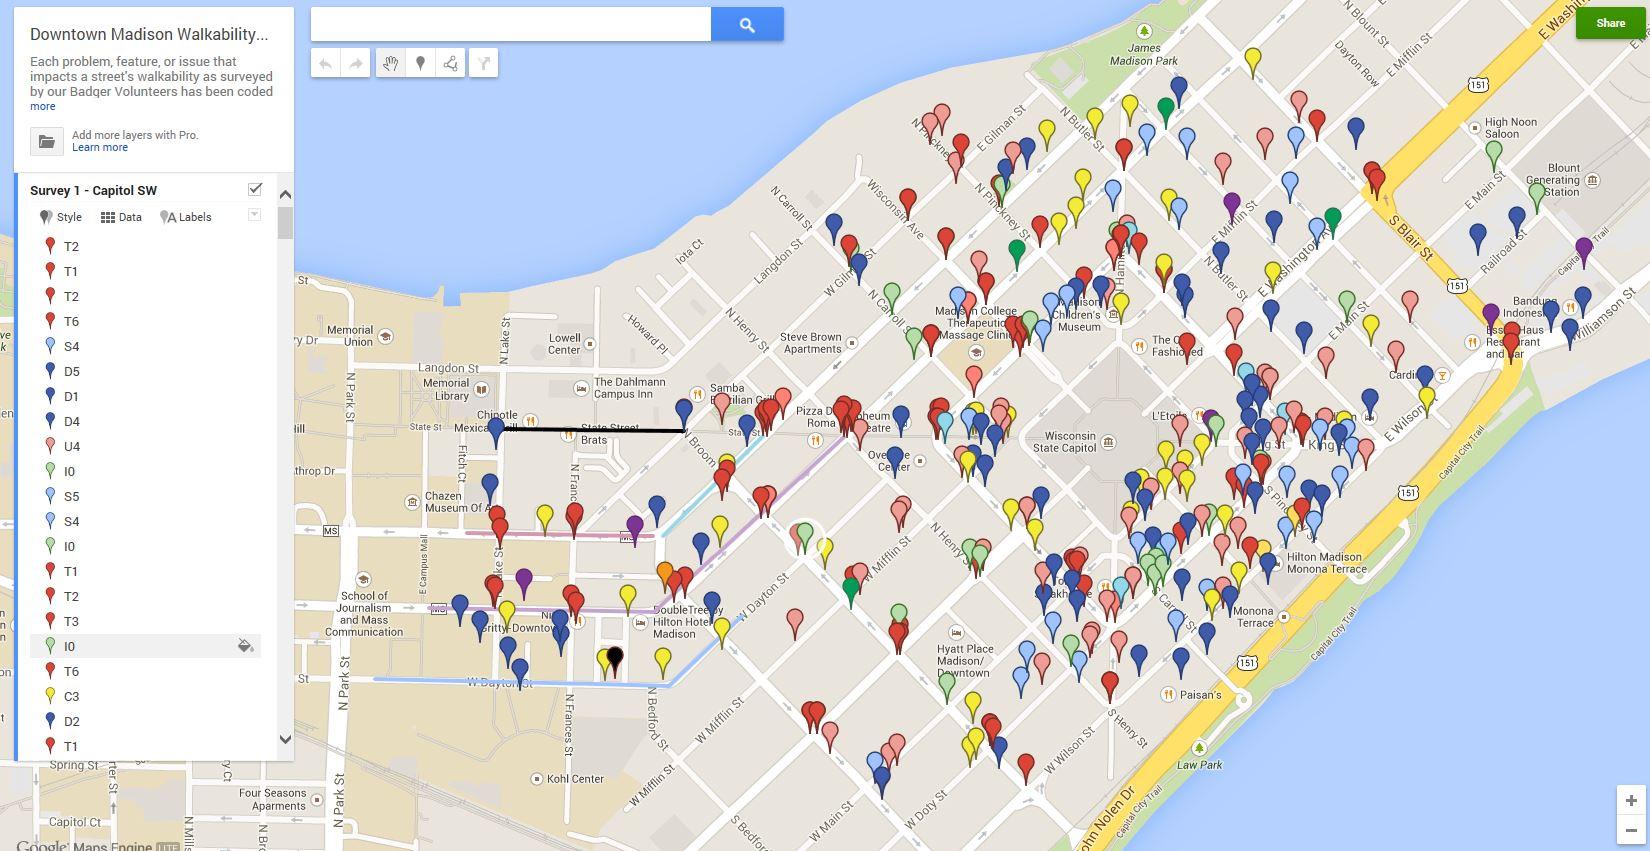 Badger Volunteers complete comprehensive walkability survey of